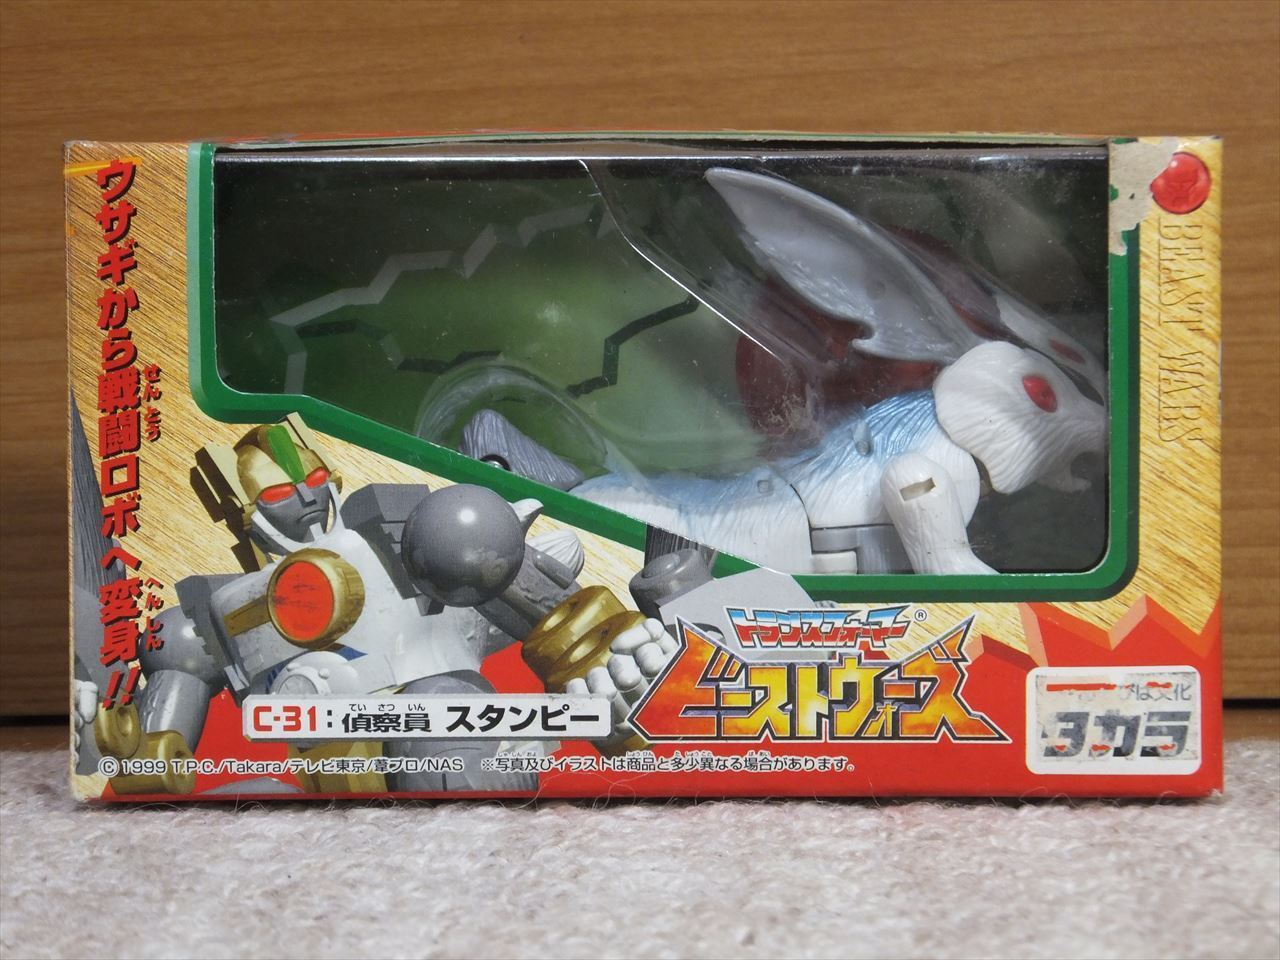 Transformers Beast Wars TAKARA C-31 C-31 C-31 CYBERTRON STAMPY rare 2b4e04